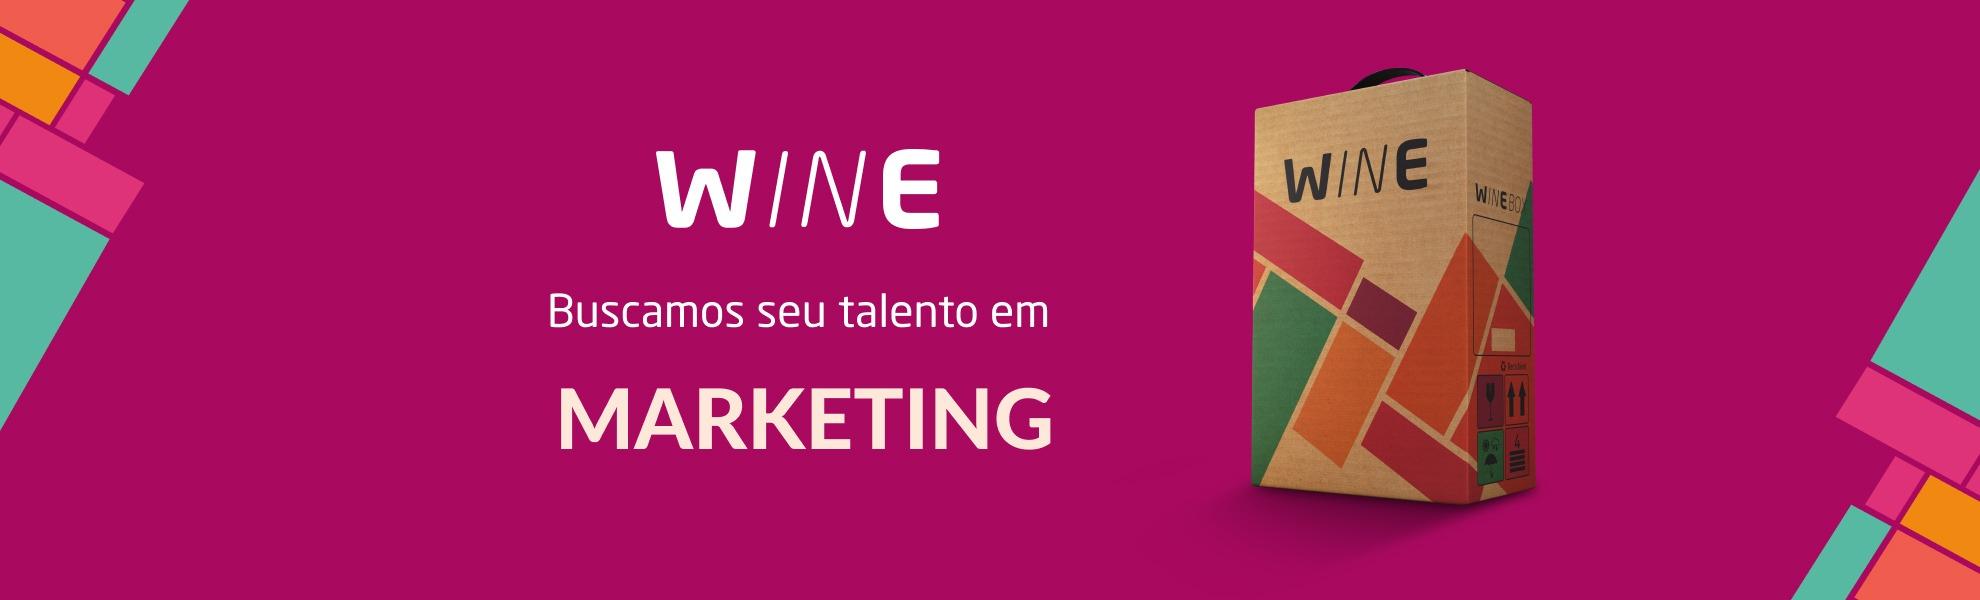 Especialista em Marketing (Web/Data Analytics)